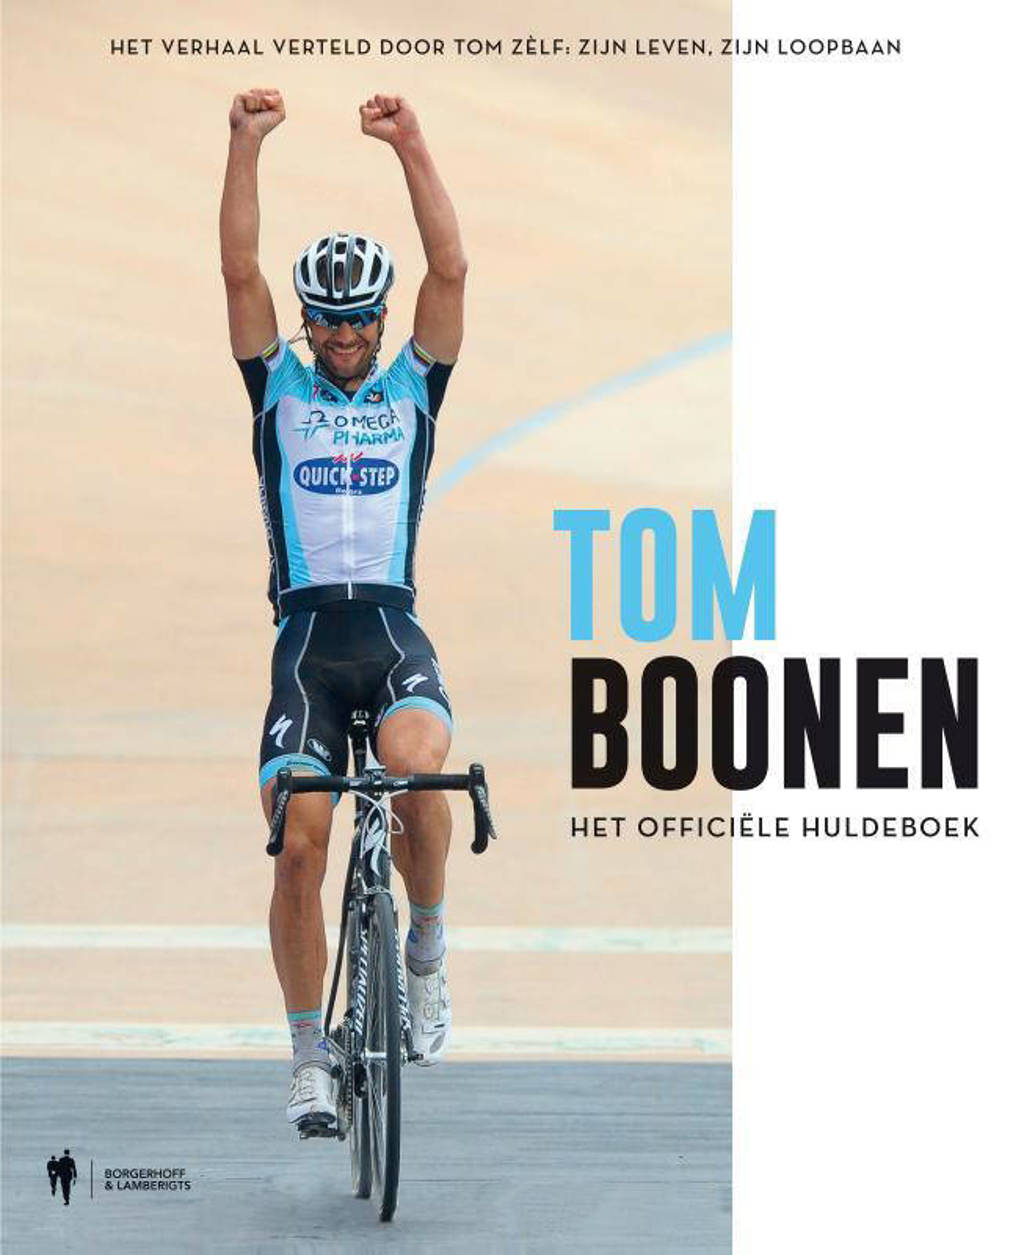 Tom Boonen - Tom Boonen